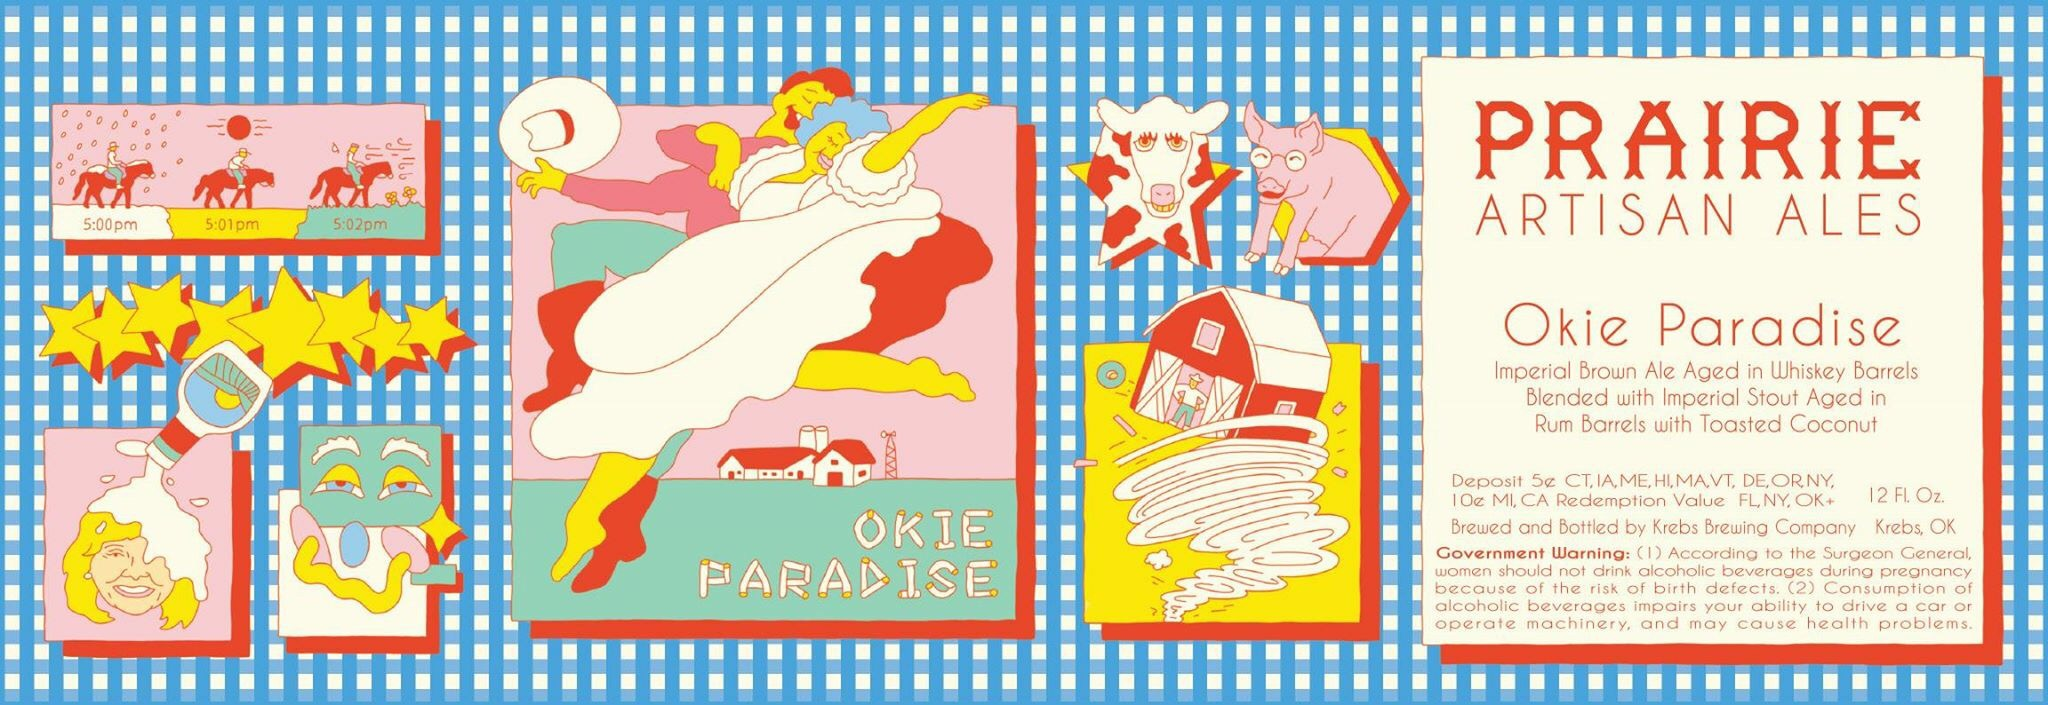 Prarie: In Okie Paradise